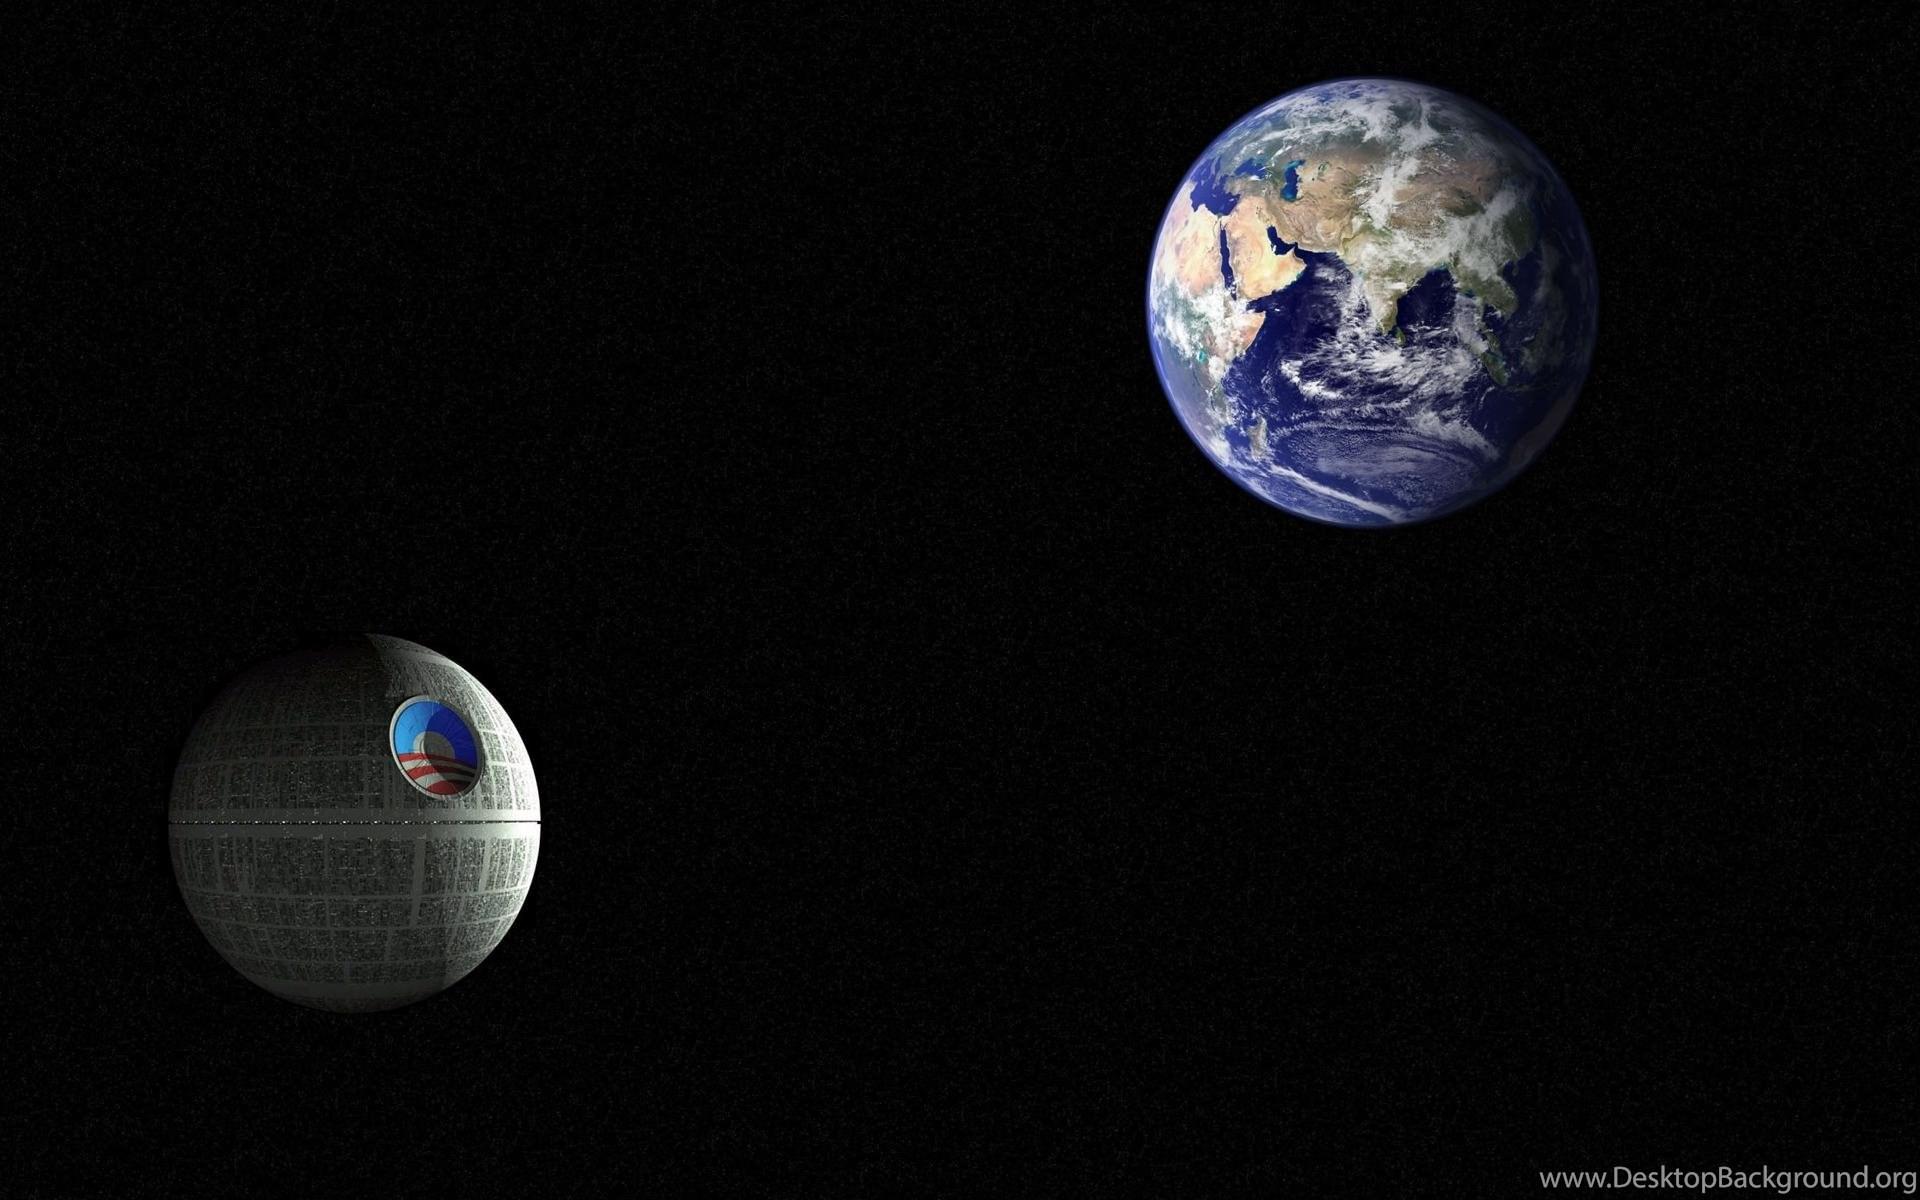 Earth Death Star Wars Digital Art 1920x1200 HD Wallpapers